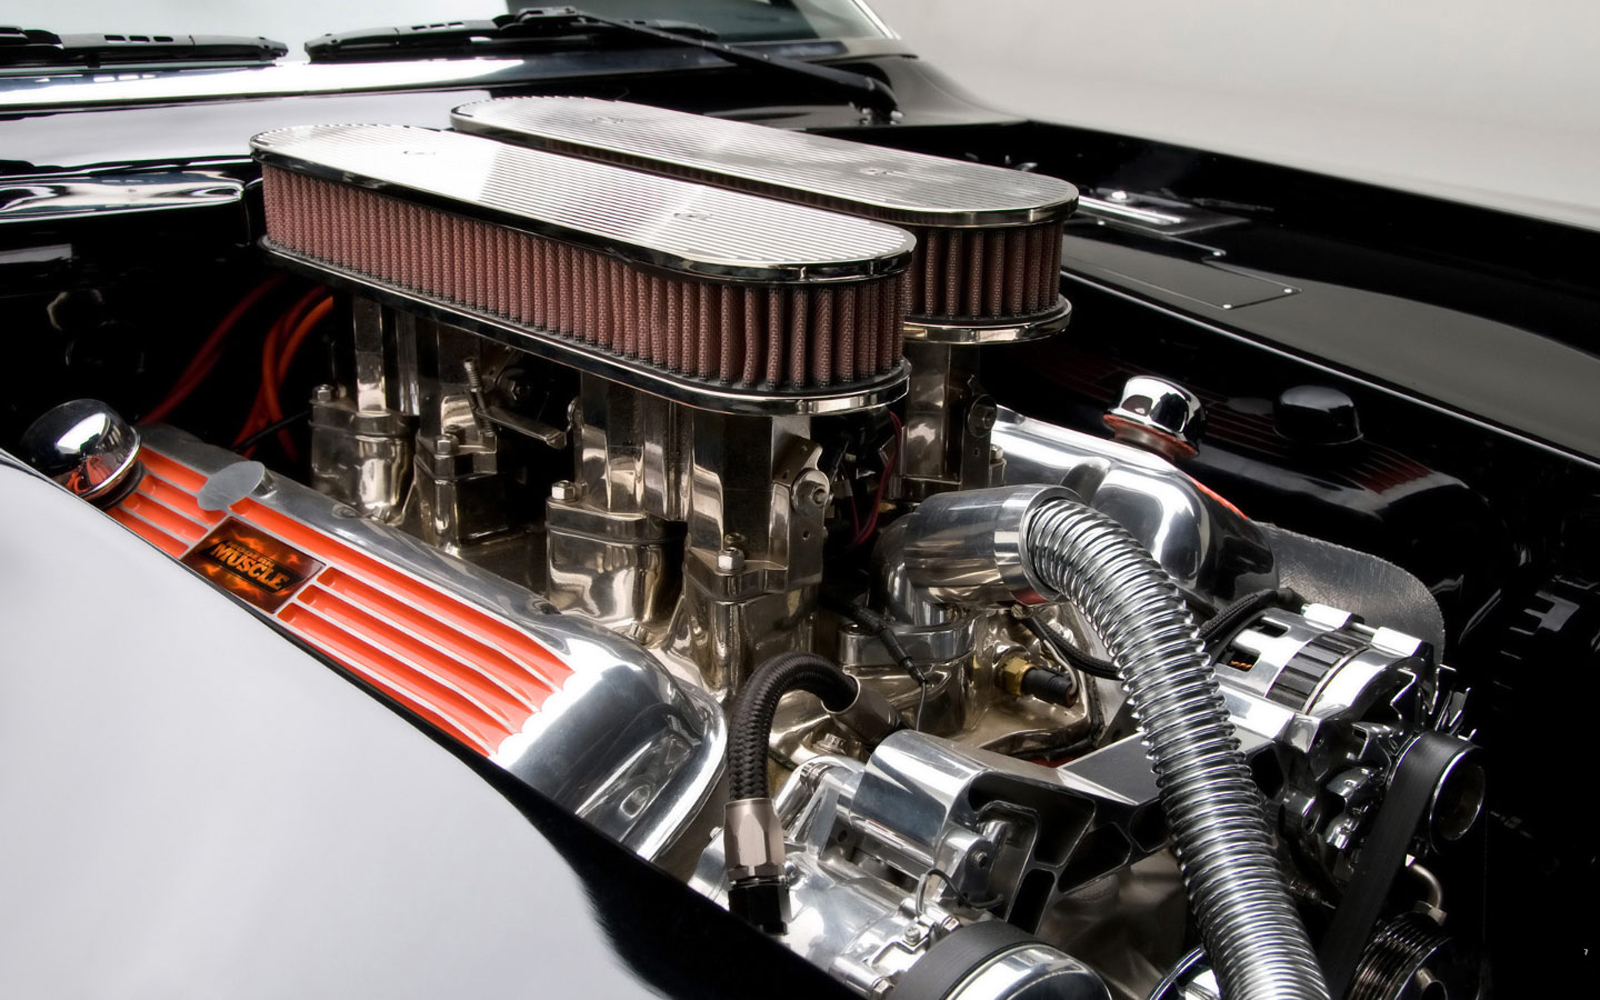 http://3.bp.blogspot.com/-SIYF3iREQ8I/ToSB2Mx535I/AAAAAAAABbA/bDzT9ixPMa0/s1600/Chevrolet_Camaro_Engine_HD_Wallpapers_Vvallpaper.net.jpg